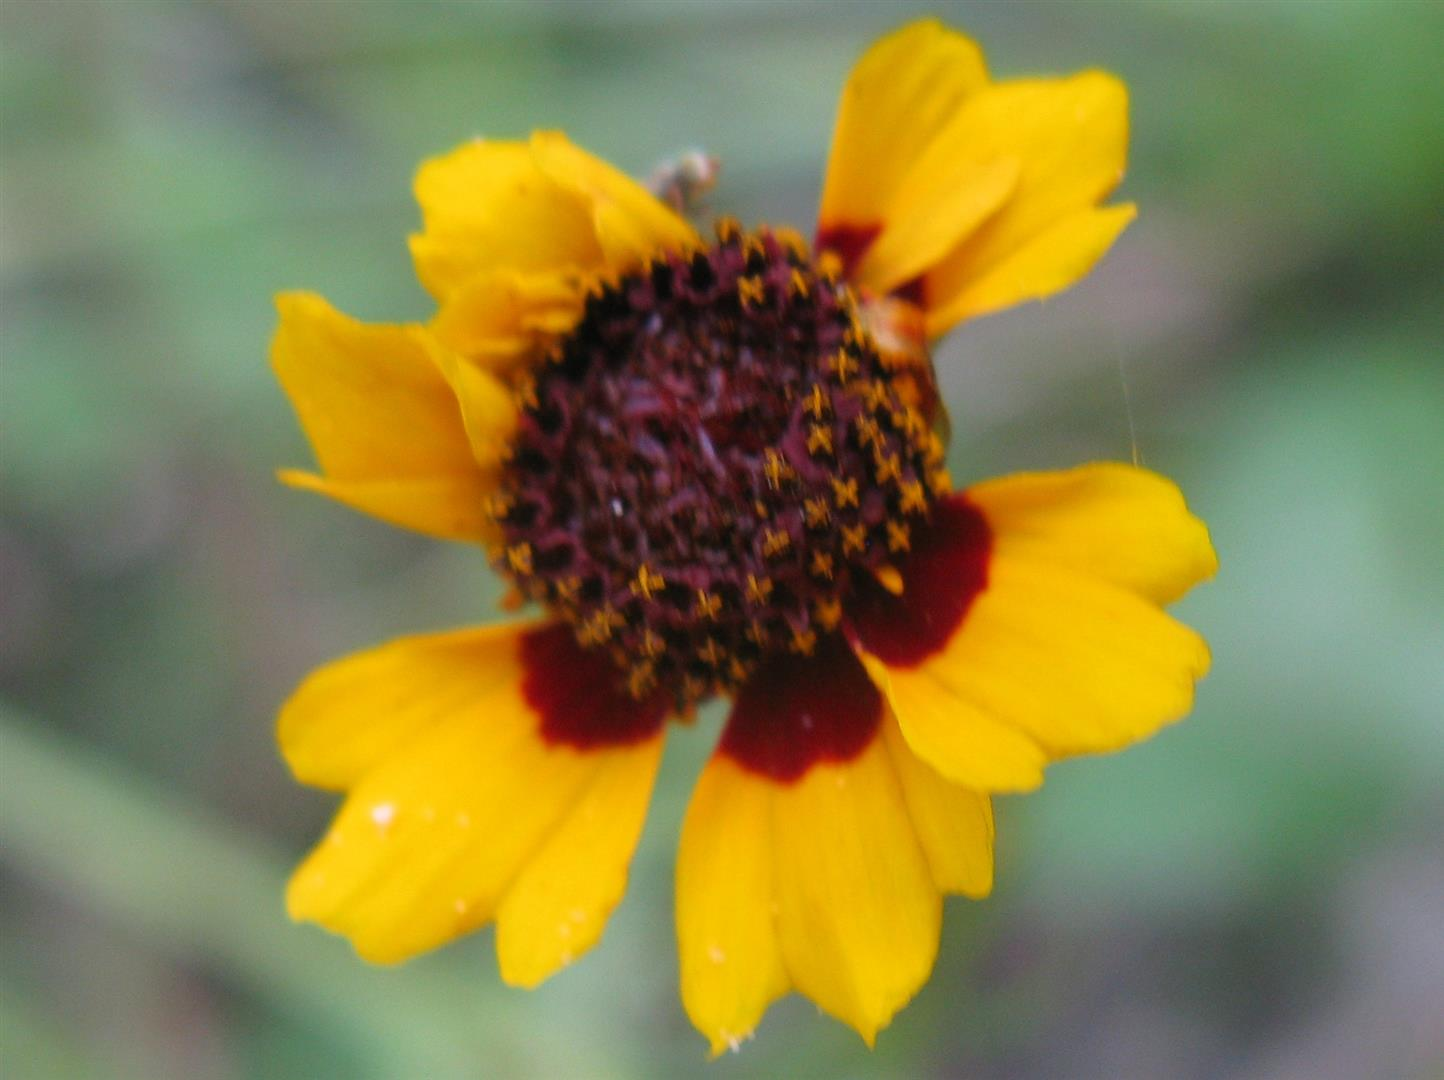 07-juillet-fleurs-2012-18-jpg